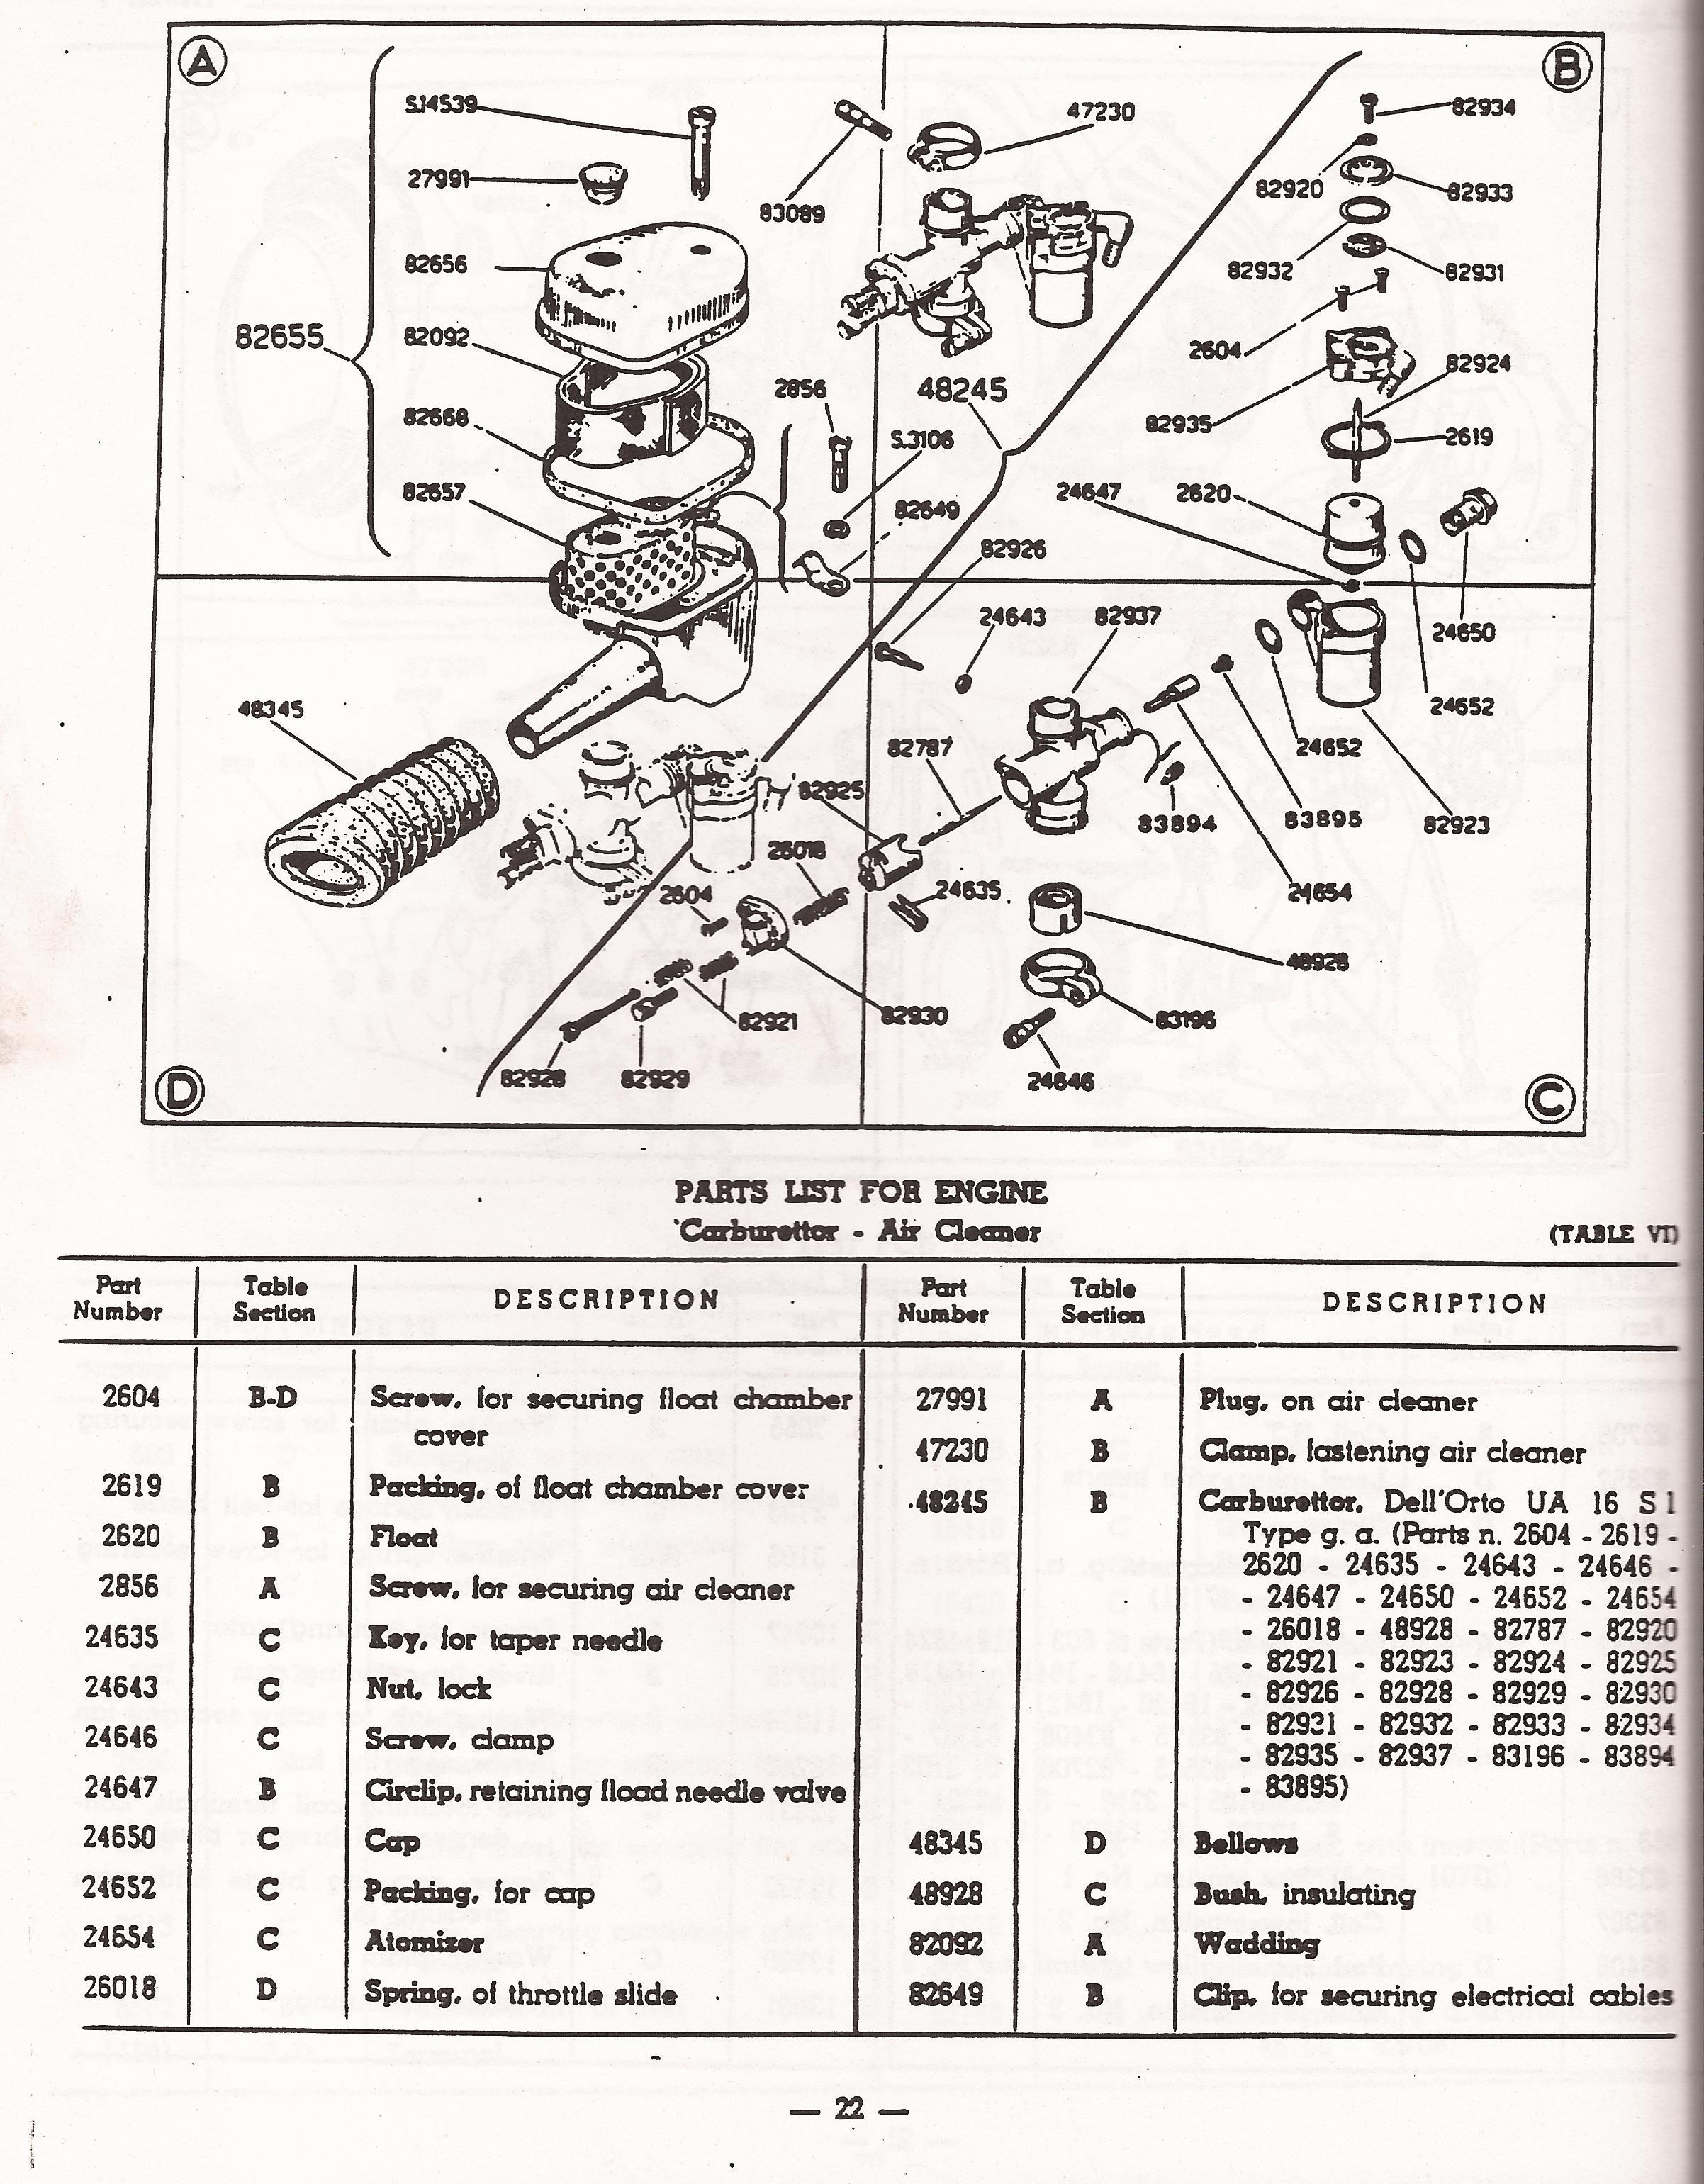 allstate 788.94493 VA9T 1958 — Kyle's Scooter Shop